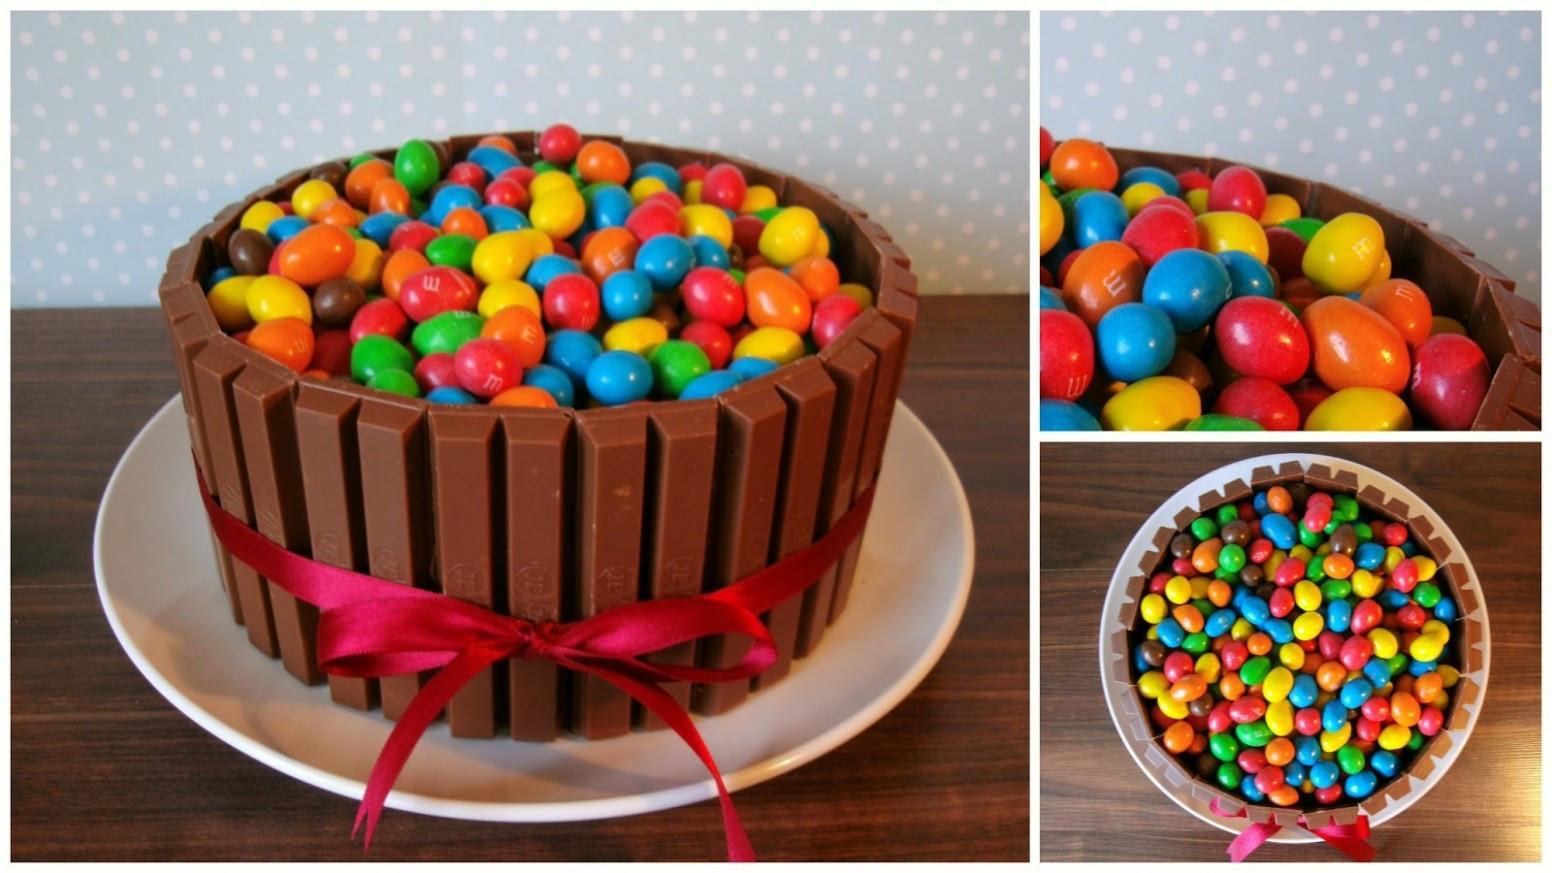 Geburtstagskuchen Ideen  geburtstagskuchen ideen – Geburtstagskuchenine